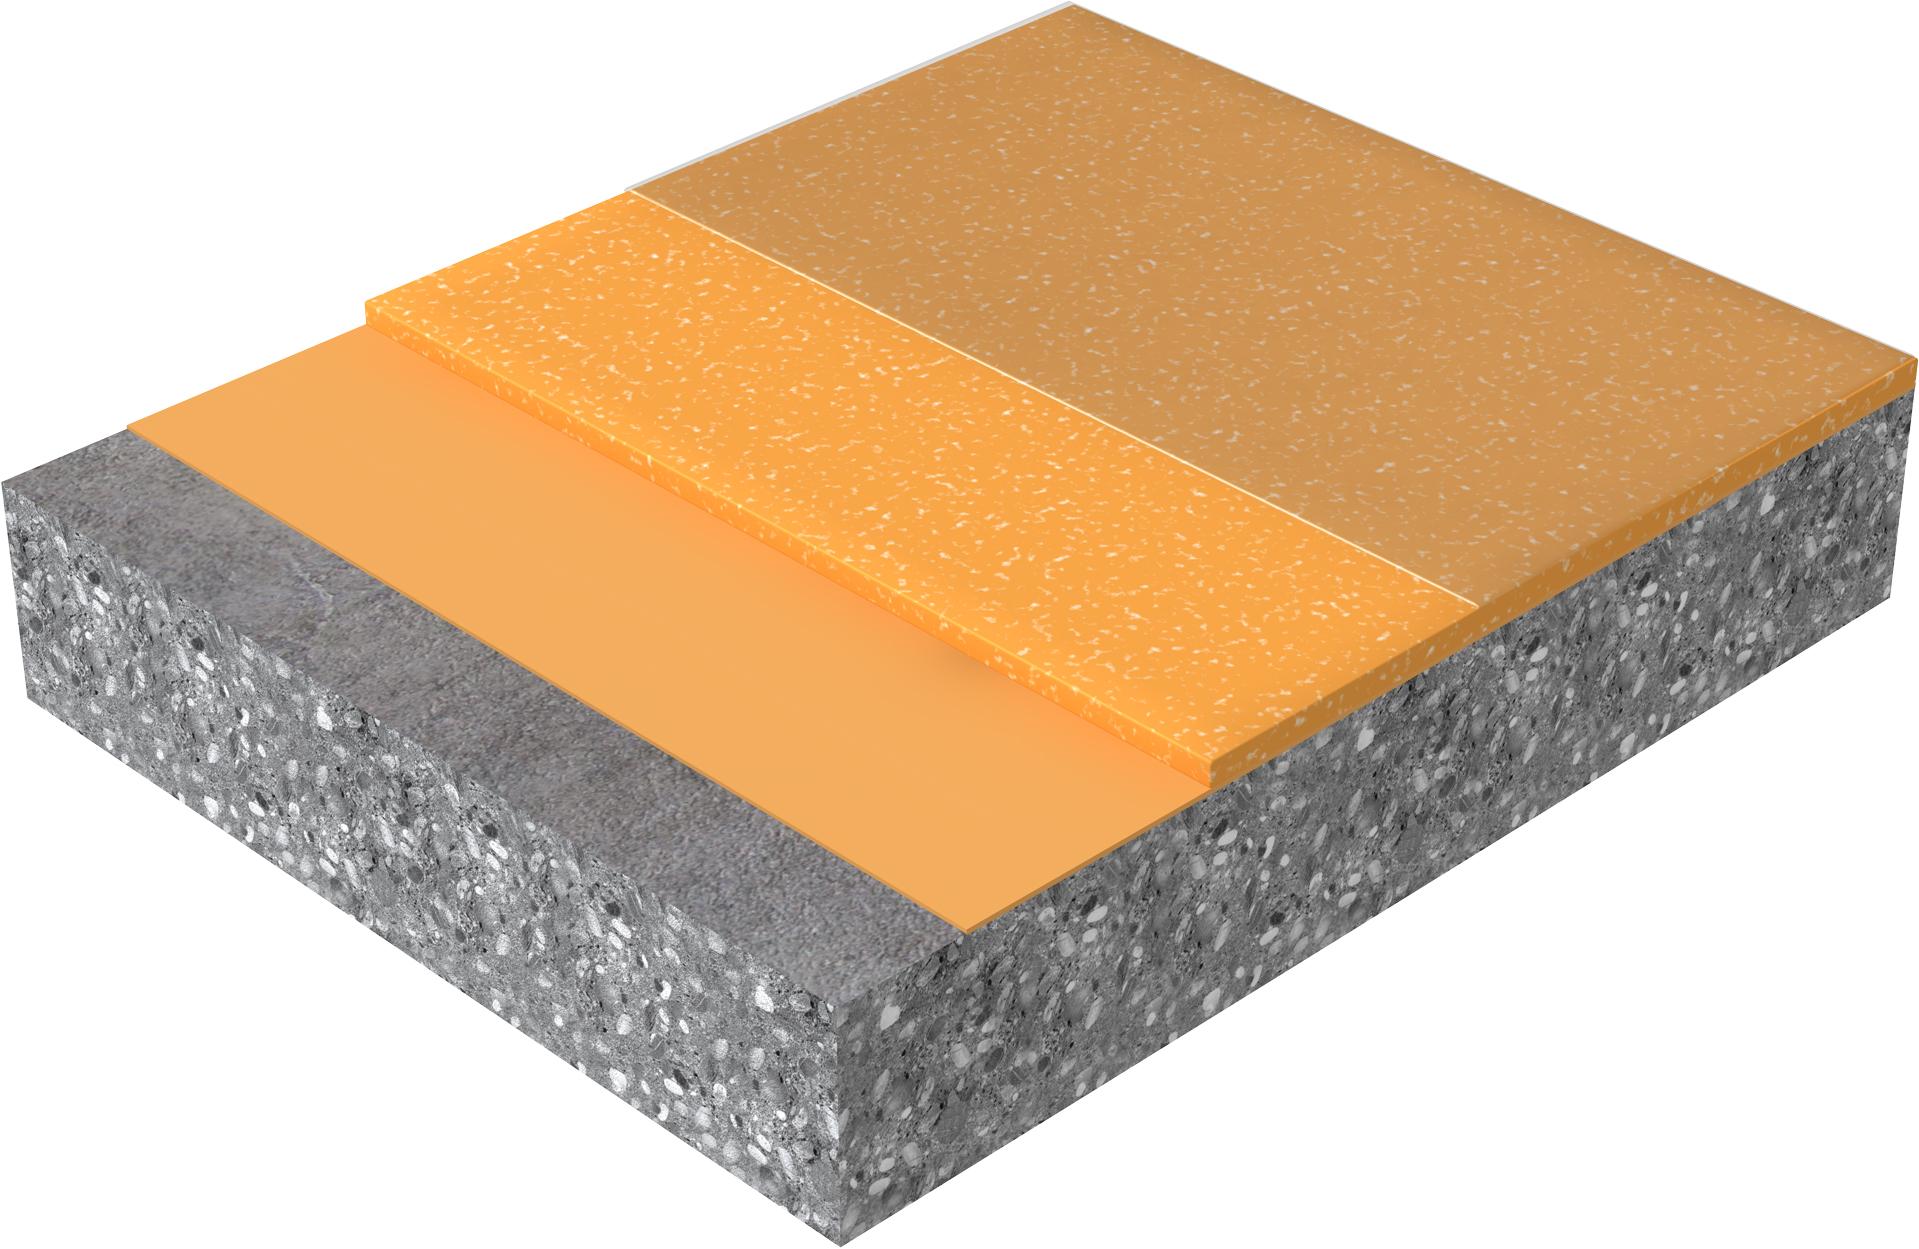 Sika® DecoFloor Resin Flooring System: Resin Flooring Systems, Resin  Flooring System